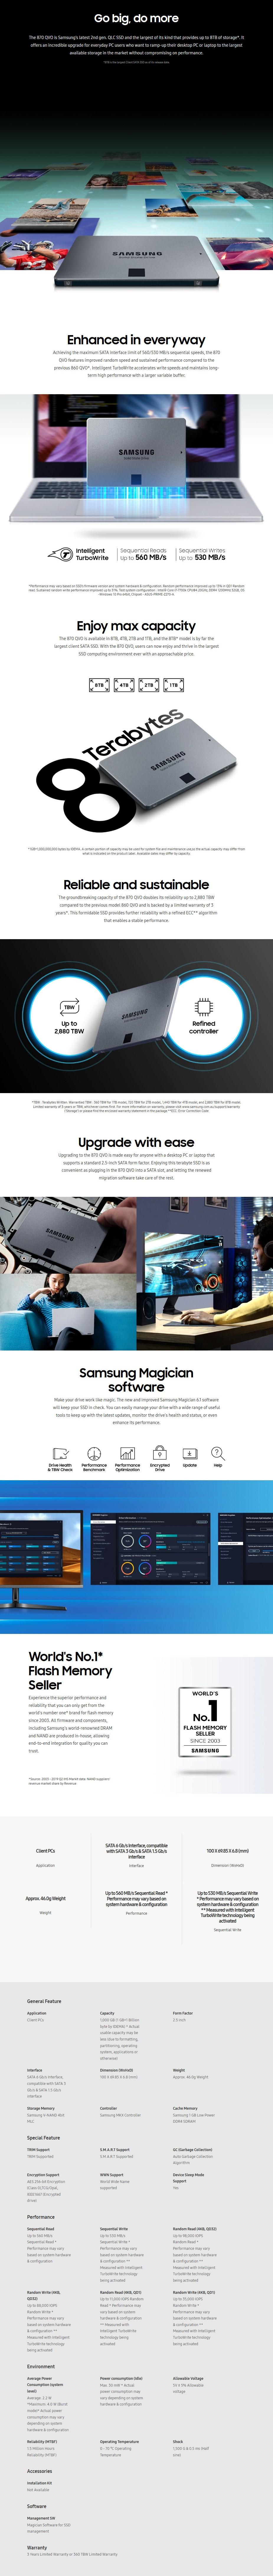 Samsung 870 QVO 1TB 2.5: SATA III 6GB/s 4-Bit MLC V-NAND SSD MZ-77Q1T0BW - Overview 1